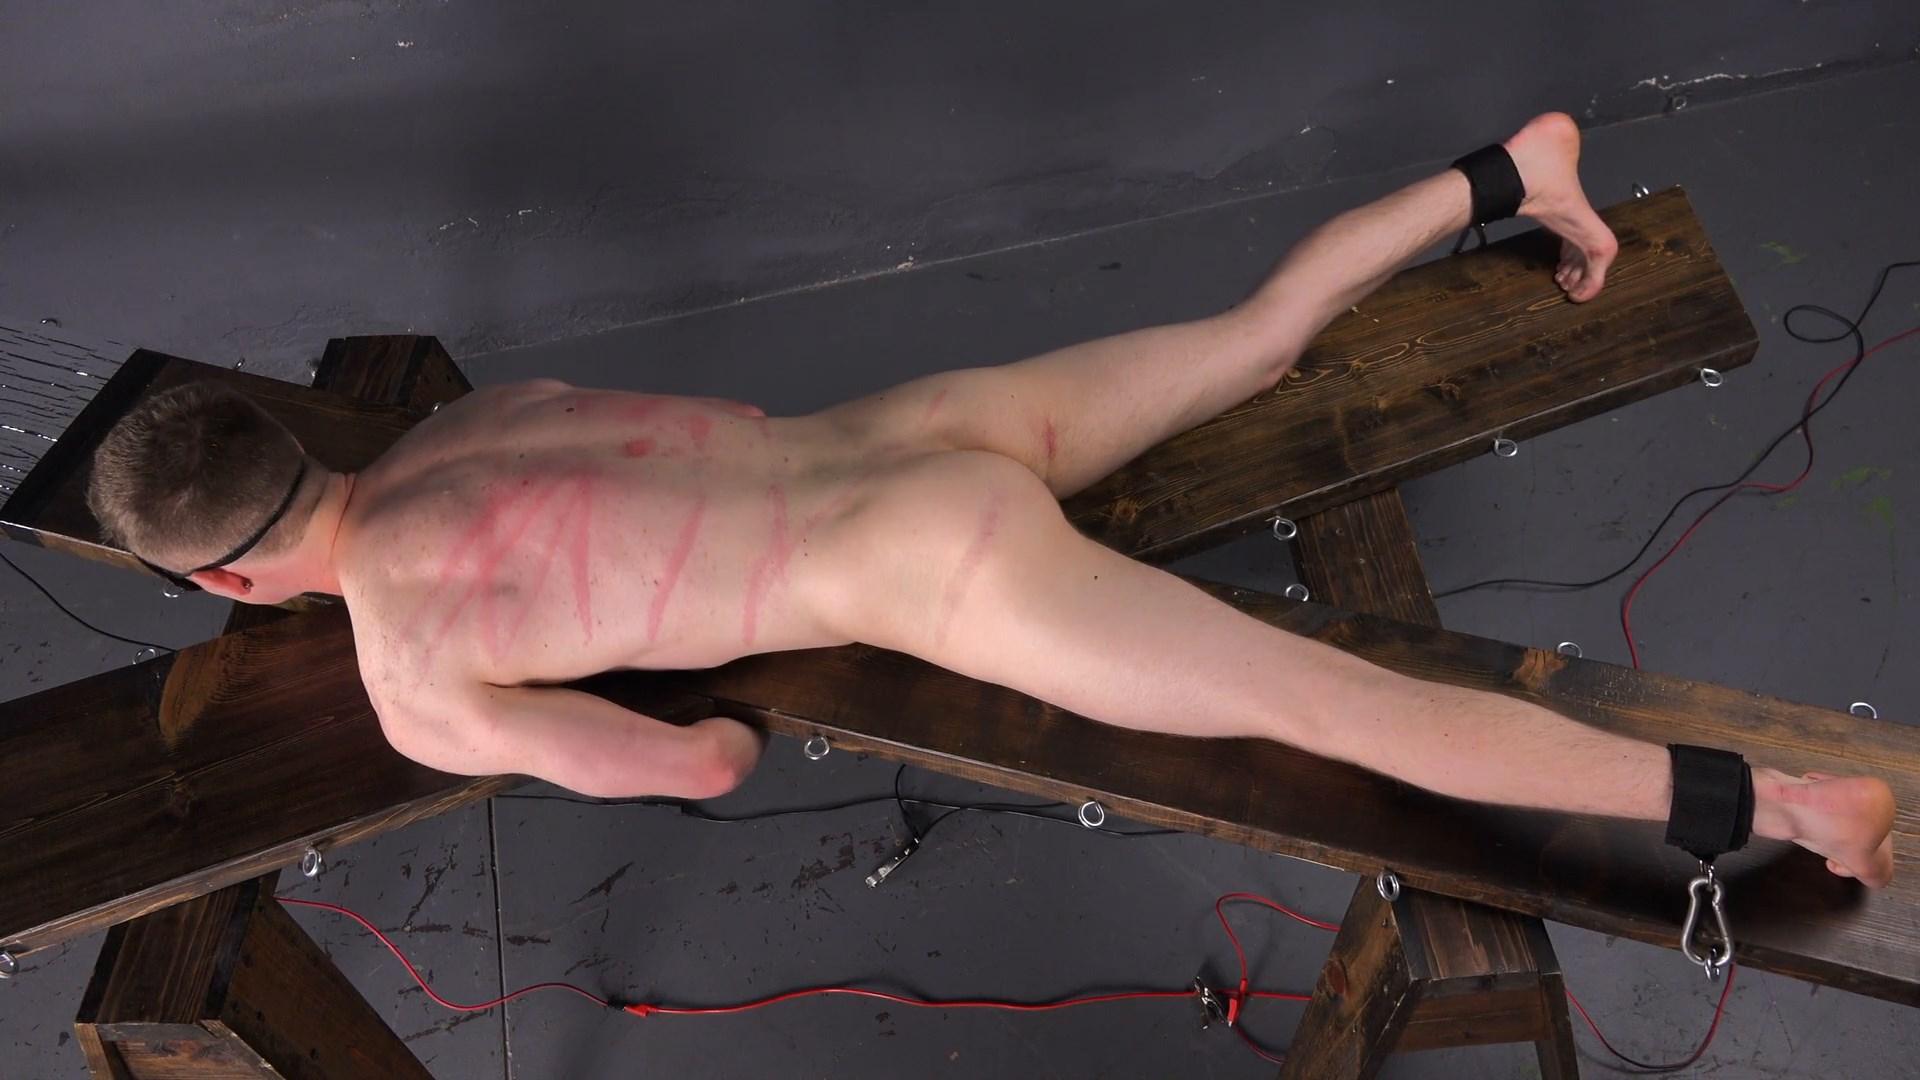 Male to bondage stories gay xxx a sadistic trap for twink scott